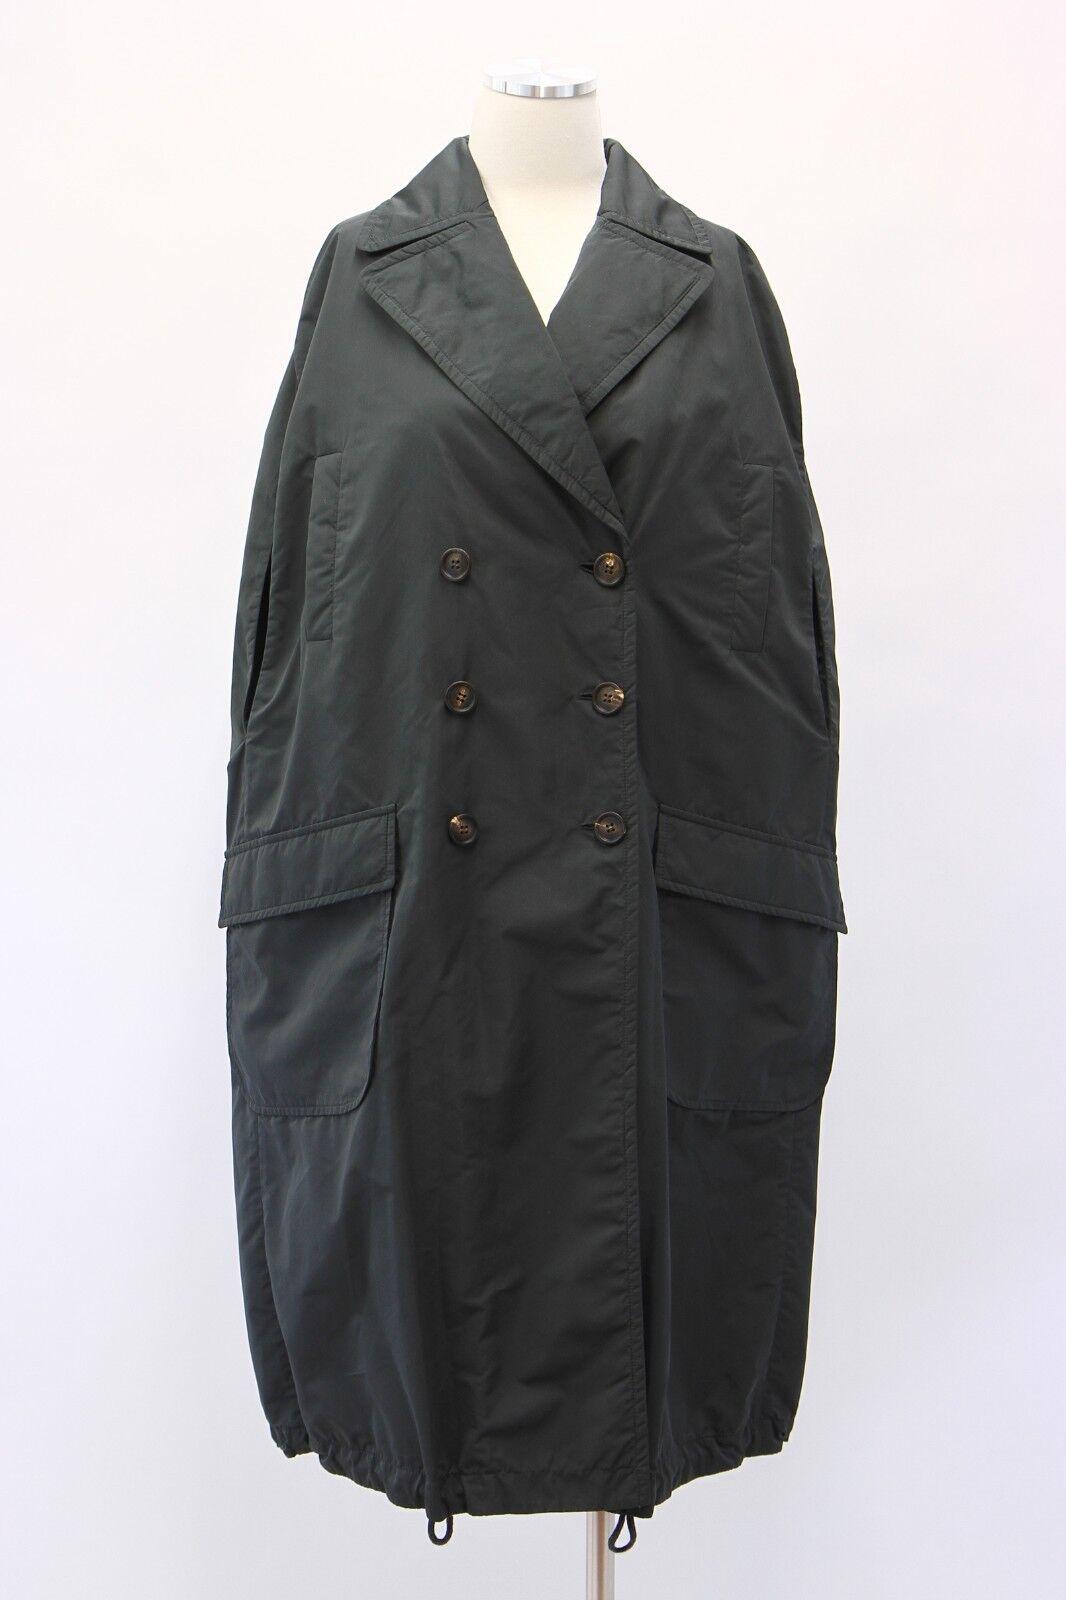 NWT 3995 Brunello Cucinelli Womens Silken DB Cape Overcoat W Logo Detail 42 A181